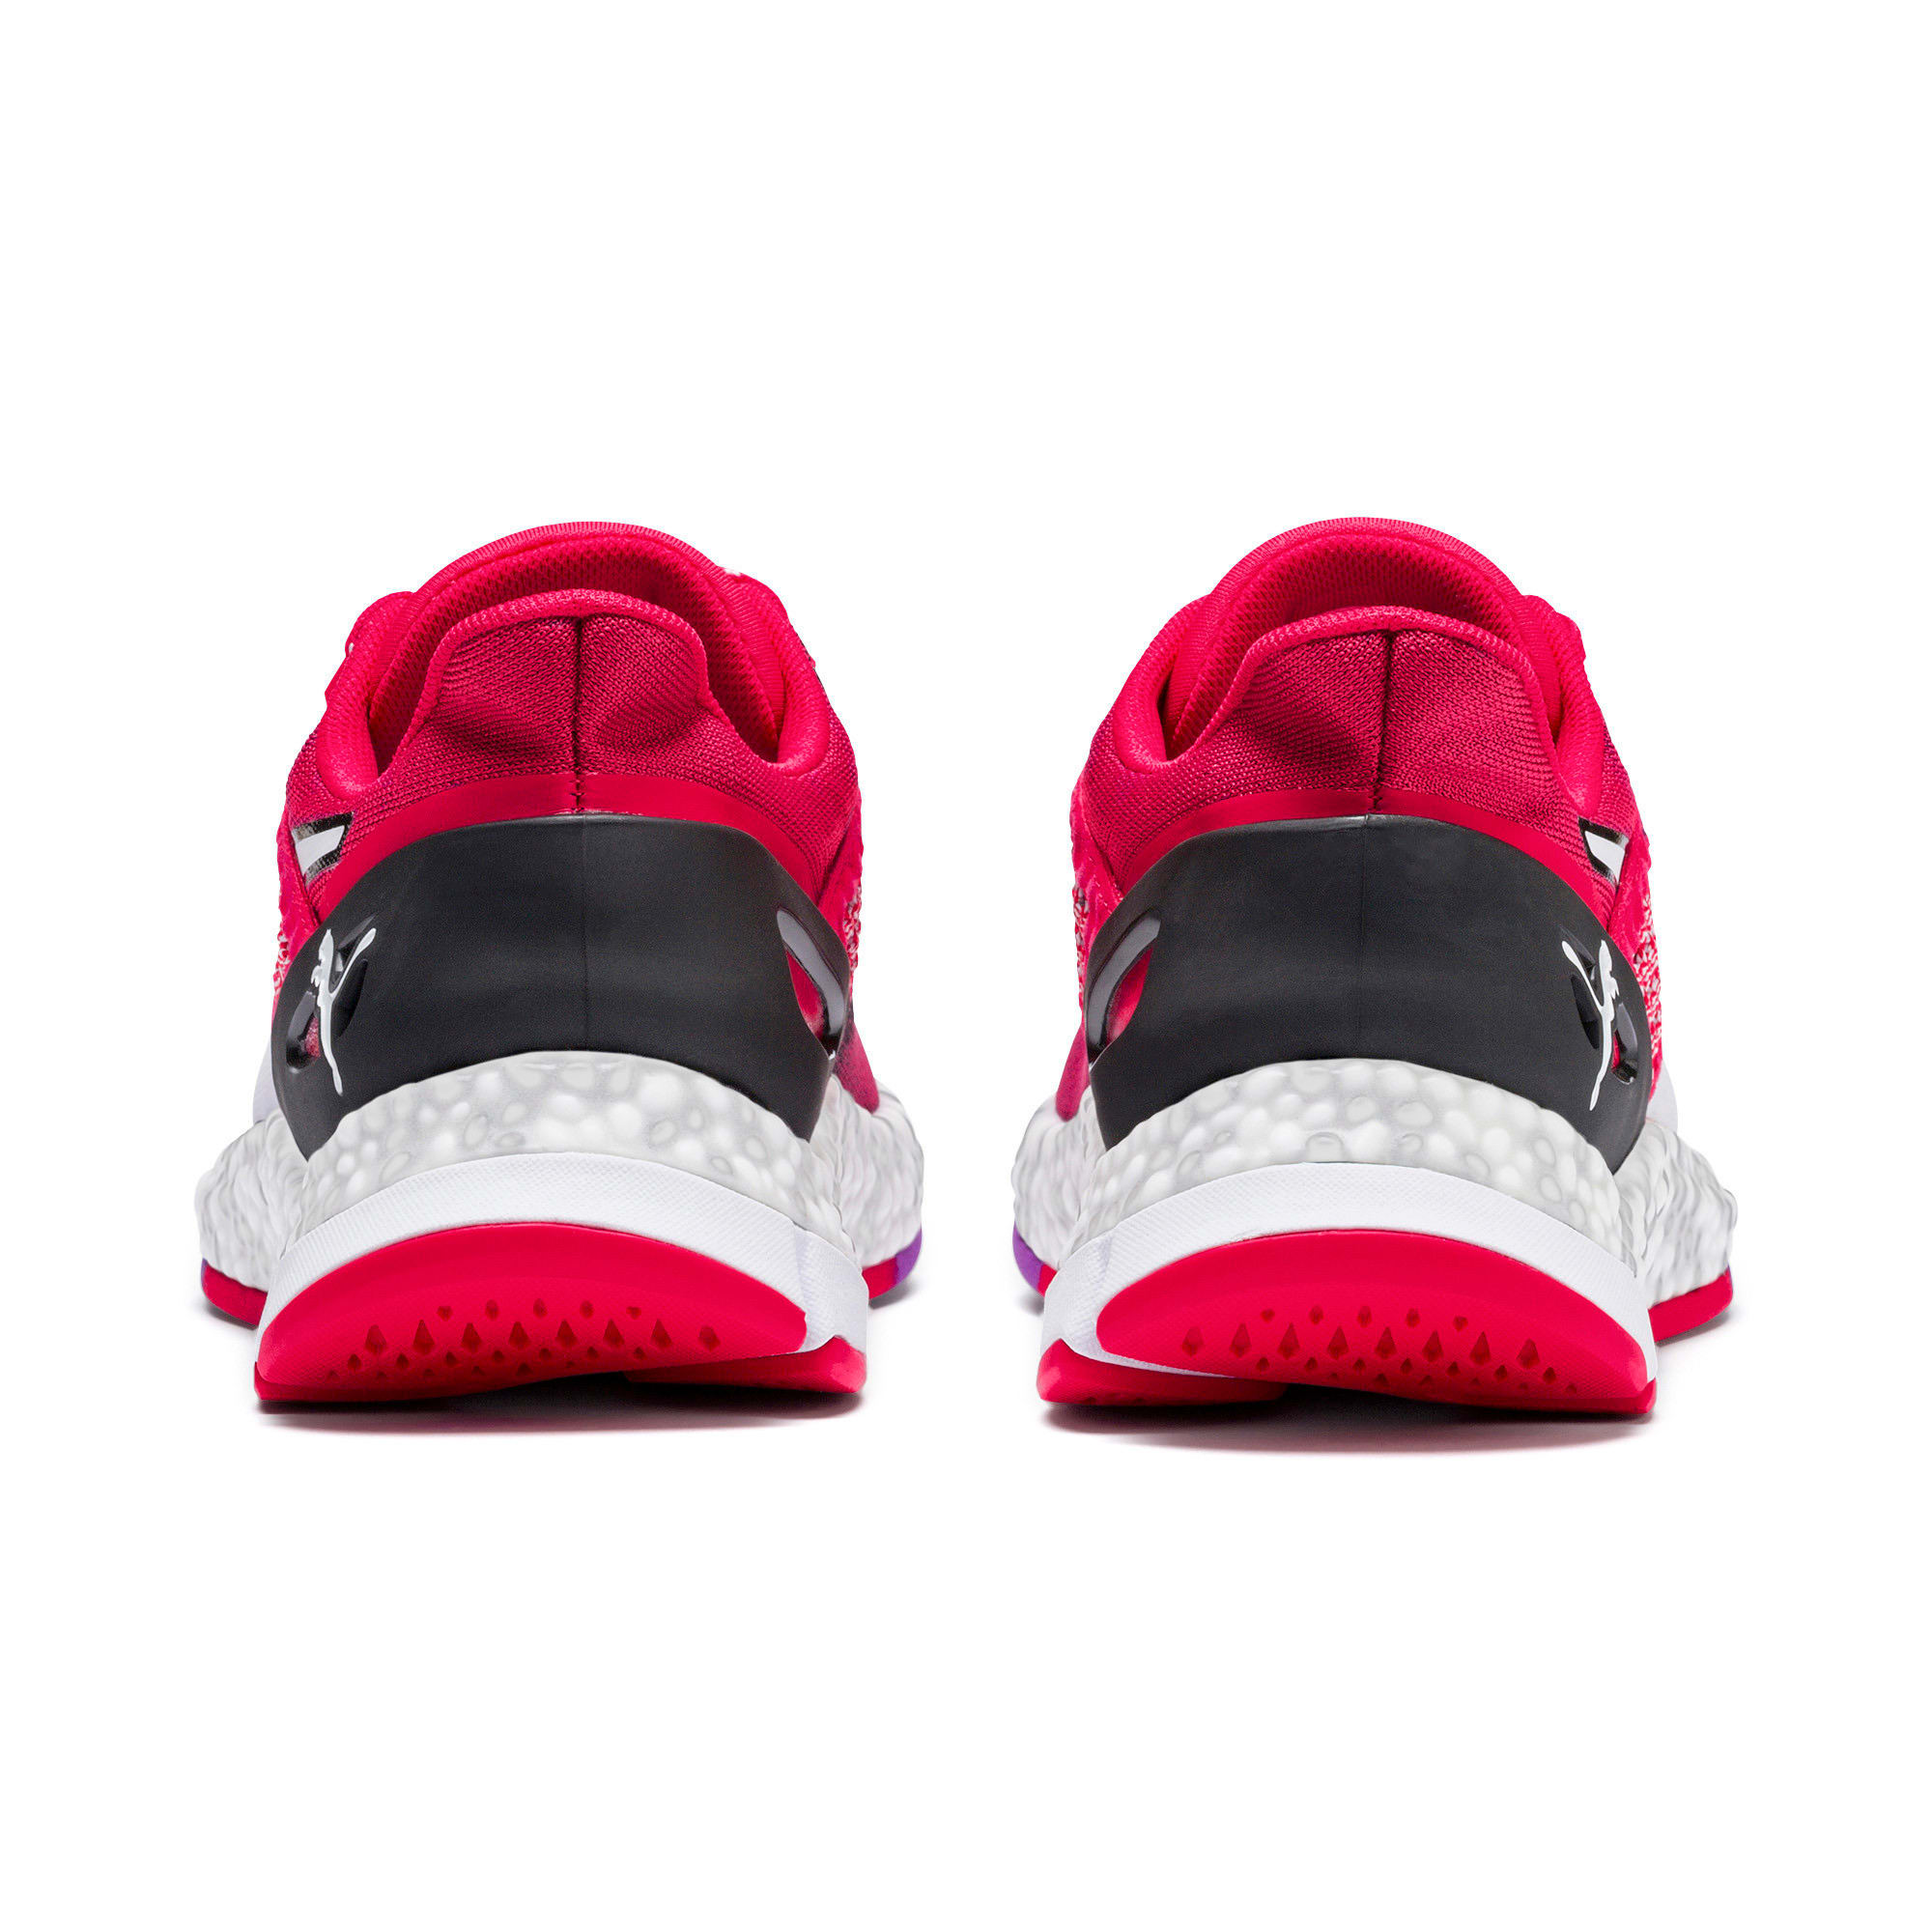 Thumbnail 4 of HYBRID Astro Women's Running Shoes, Nrgy Rose-Puma Black, medium